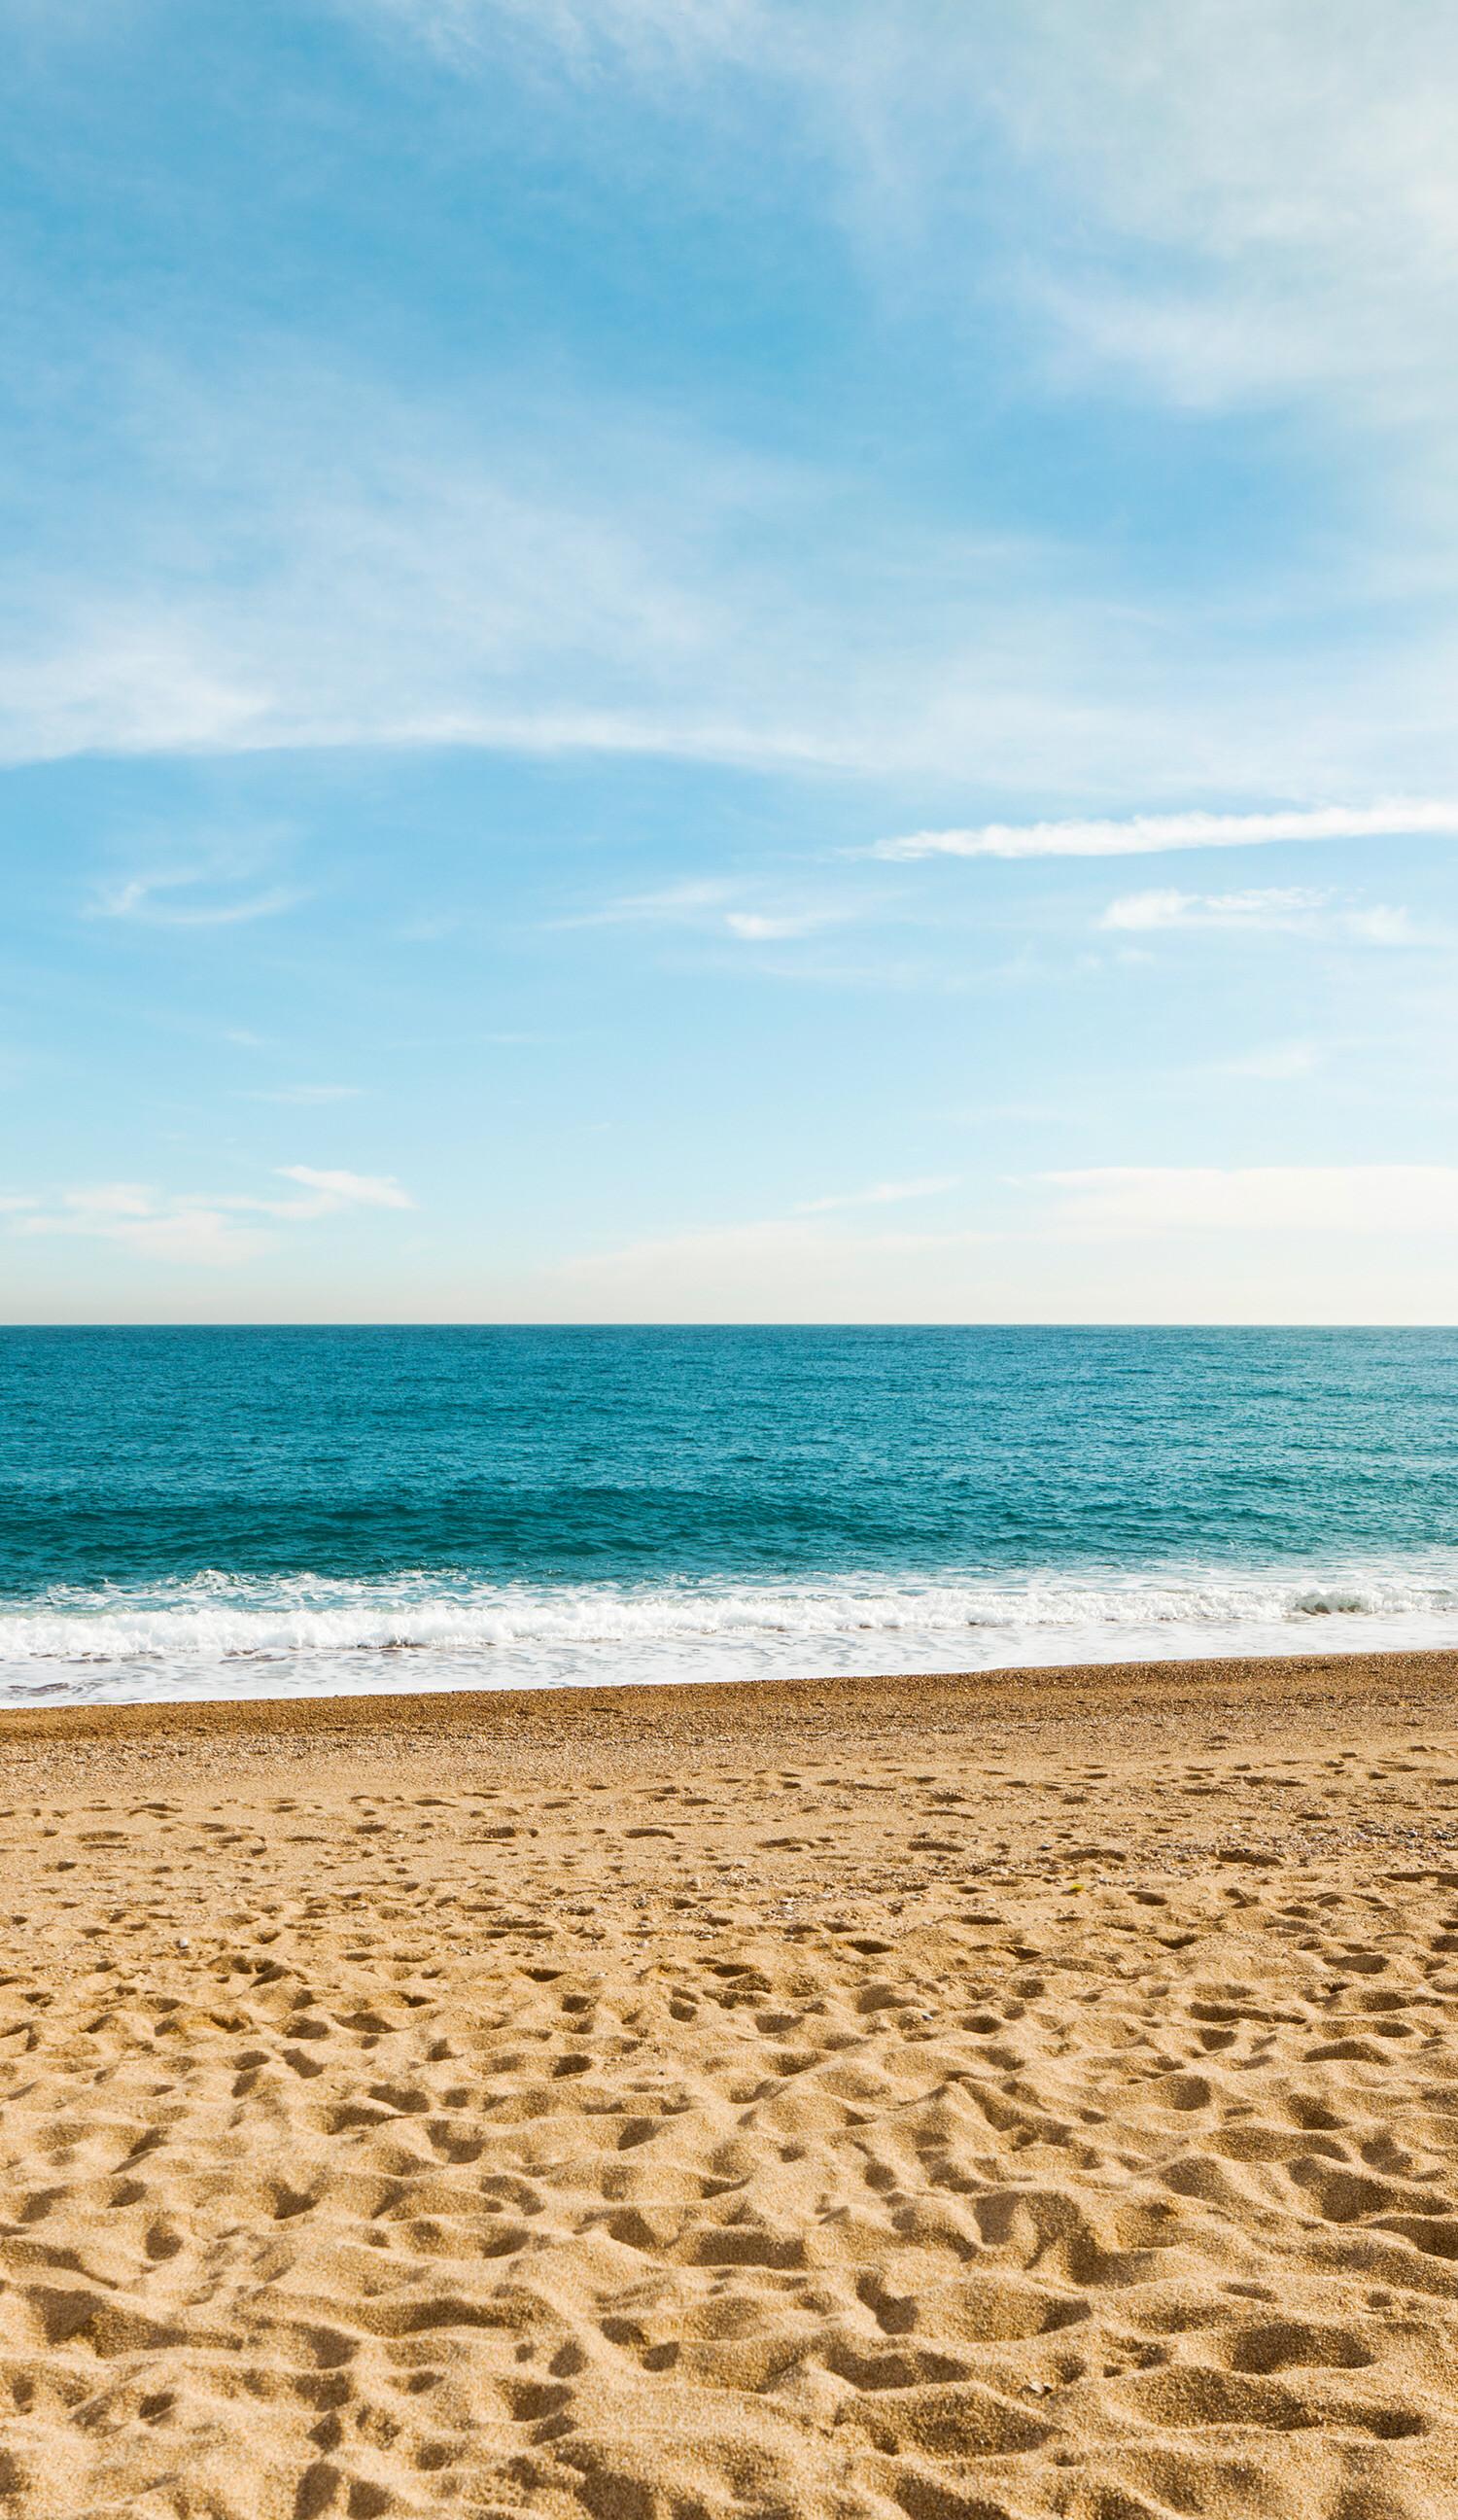 Res: 1500x2592, Beach scenes